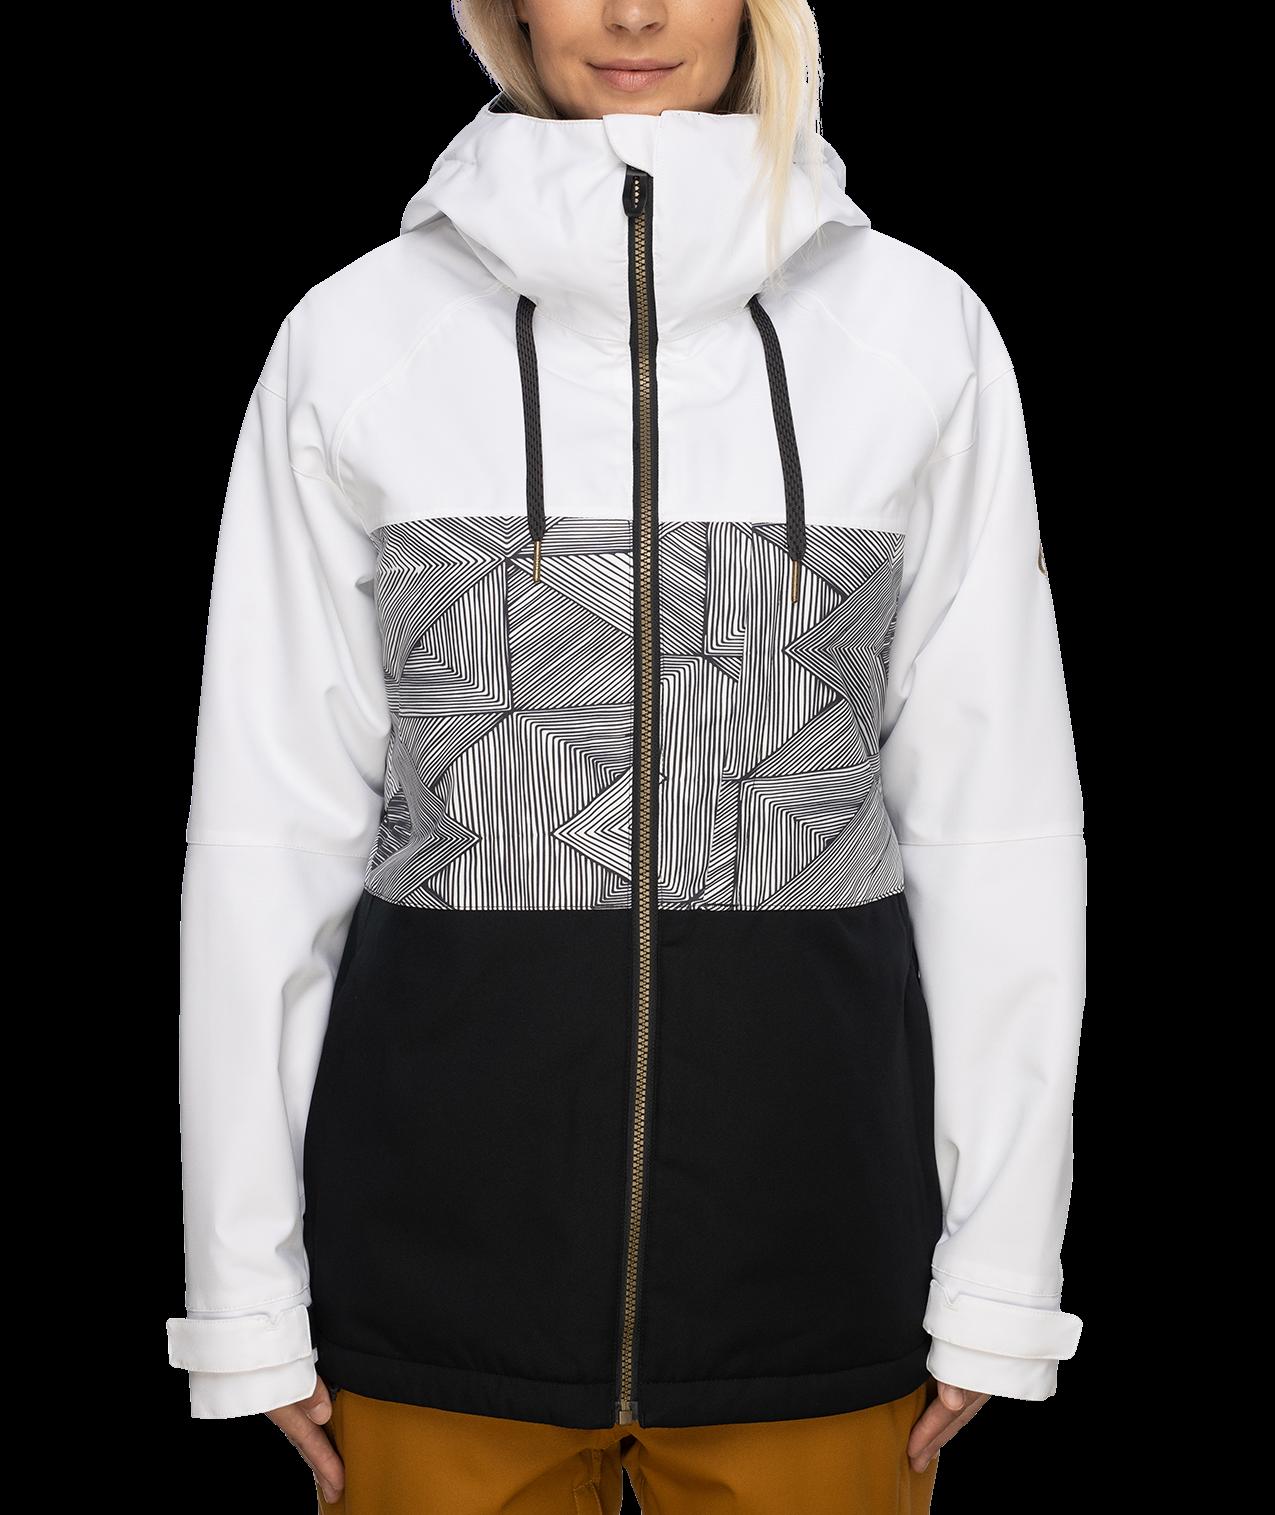 686 Women's Athena Insulated Jacket - White Geo Colorblock